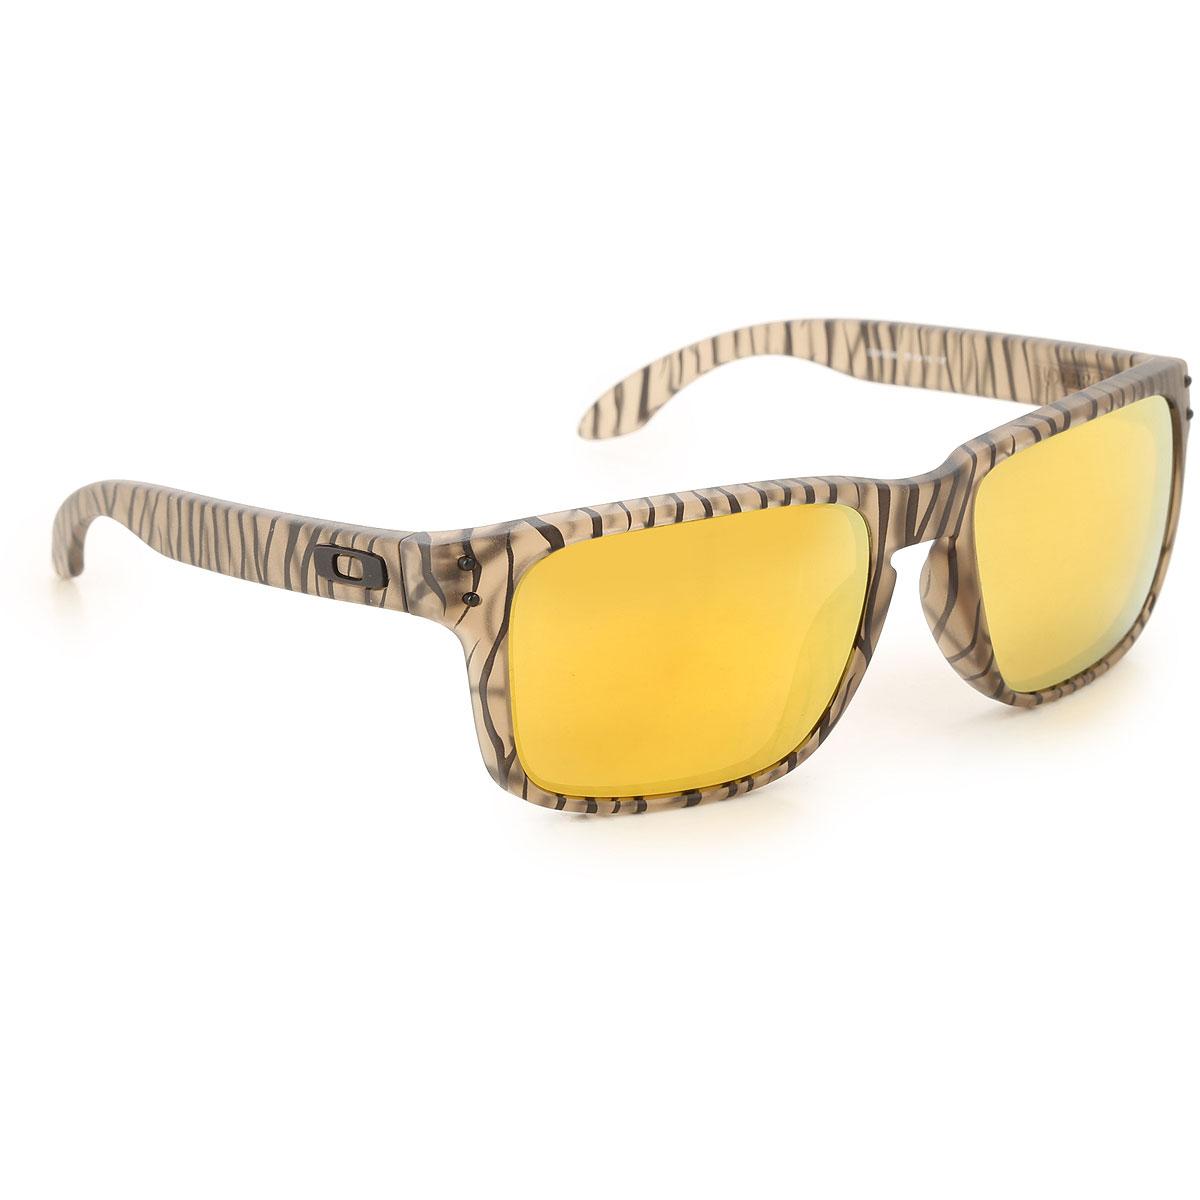 Oakley Sunglasses On Sale, Matt Striped Brown, 2019